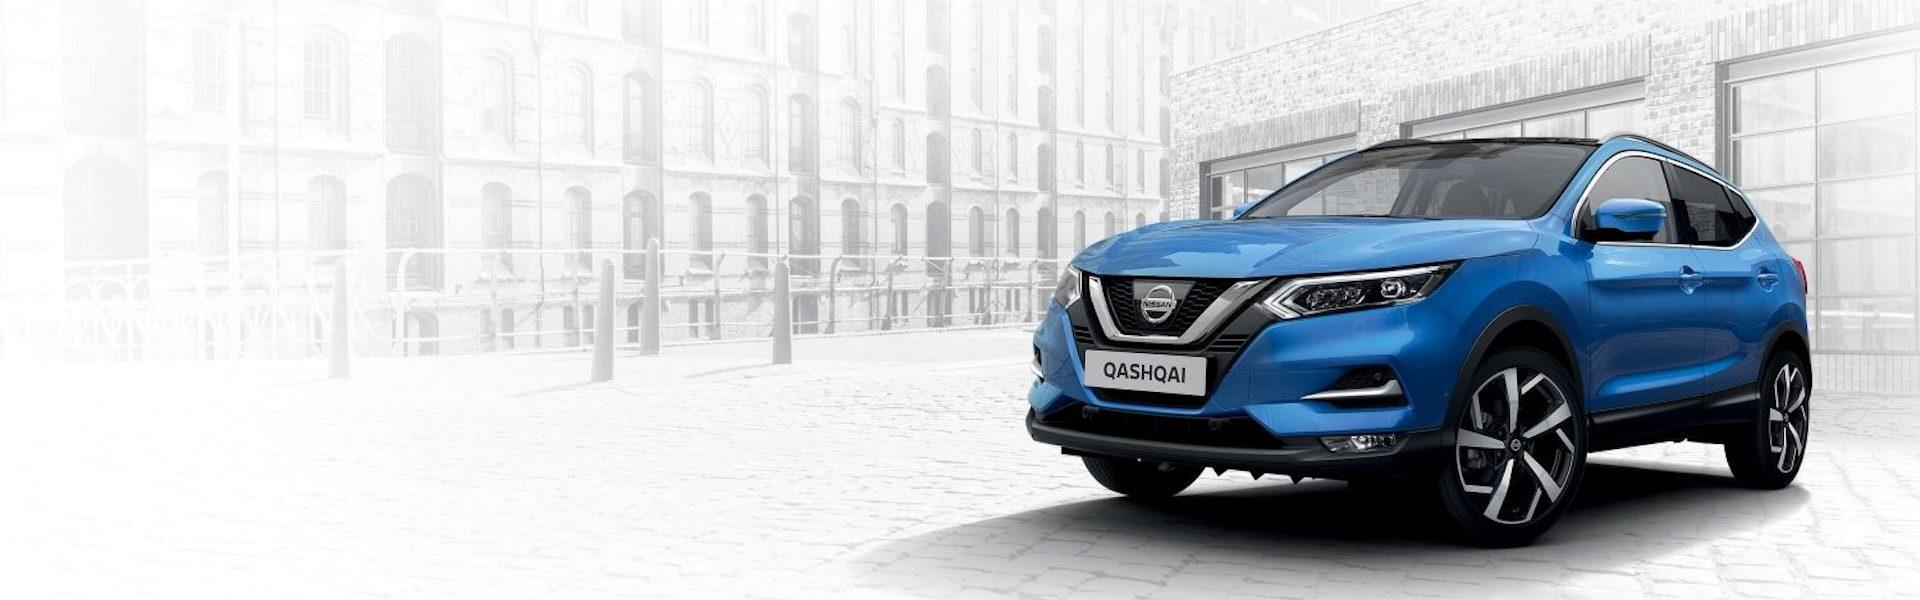 ficha técnica do Nissan Qashqai